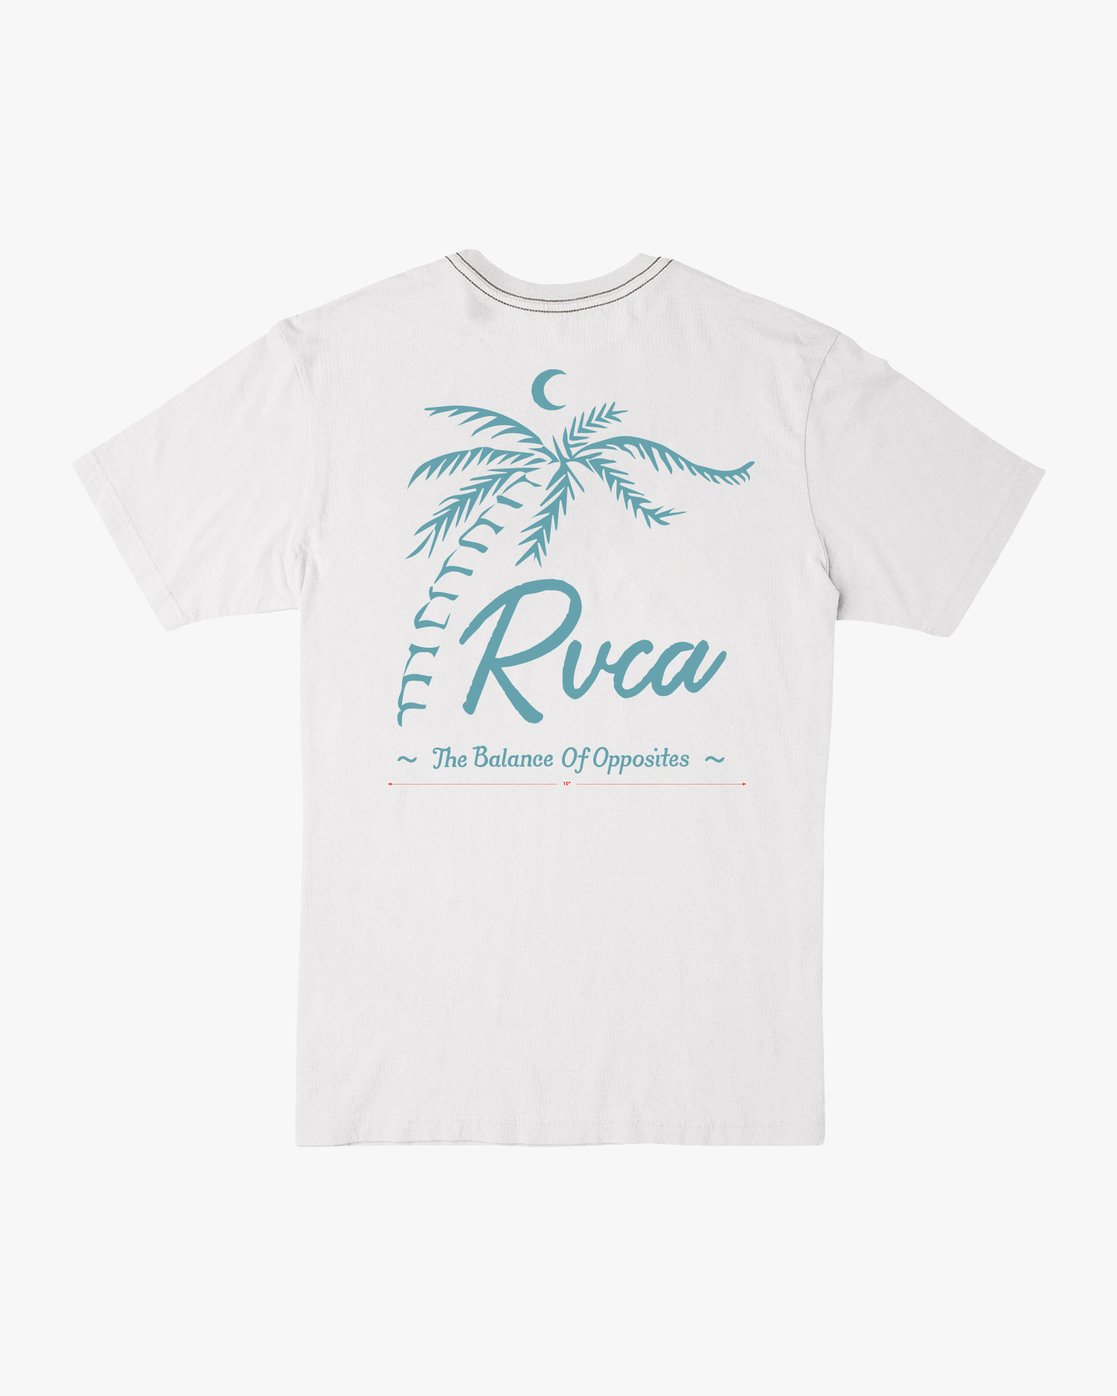 0 Mowgli Tropicale T-Shirt White M430URTR RVCA